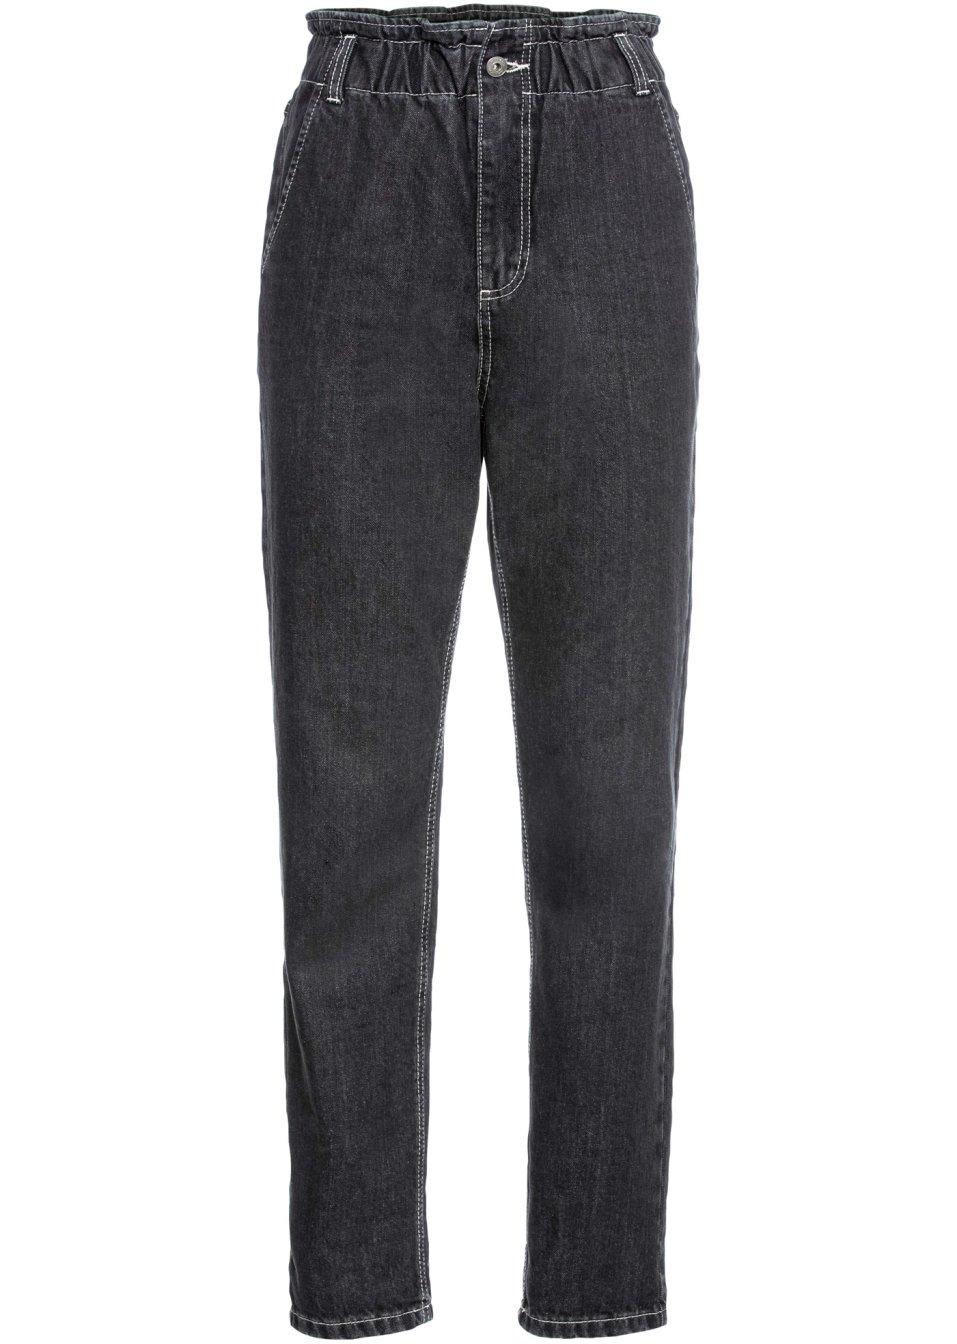 Baggy- Jeans black denim - Damen - RAINBOW - bonprix.de NhX0A xvE9O